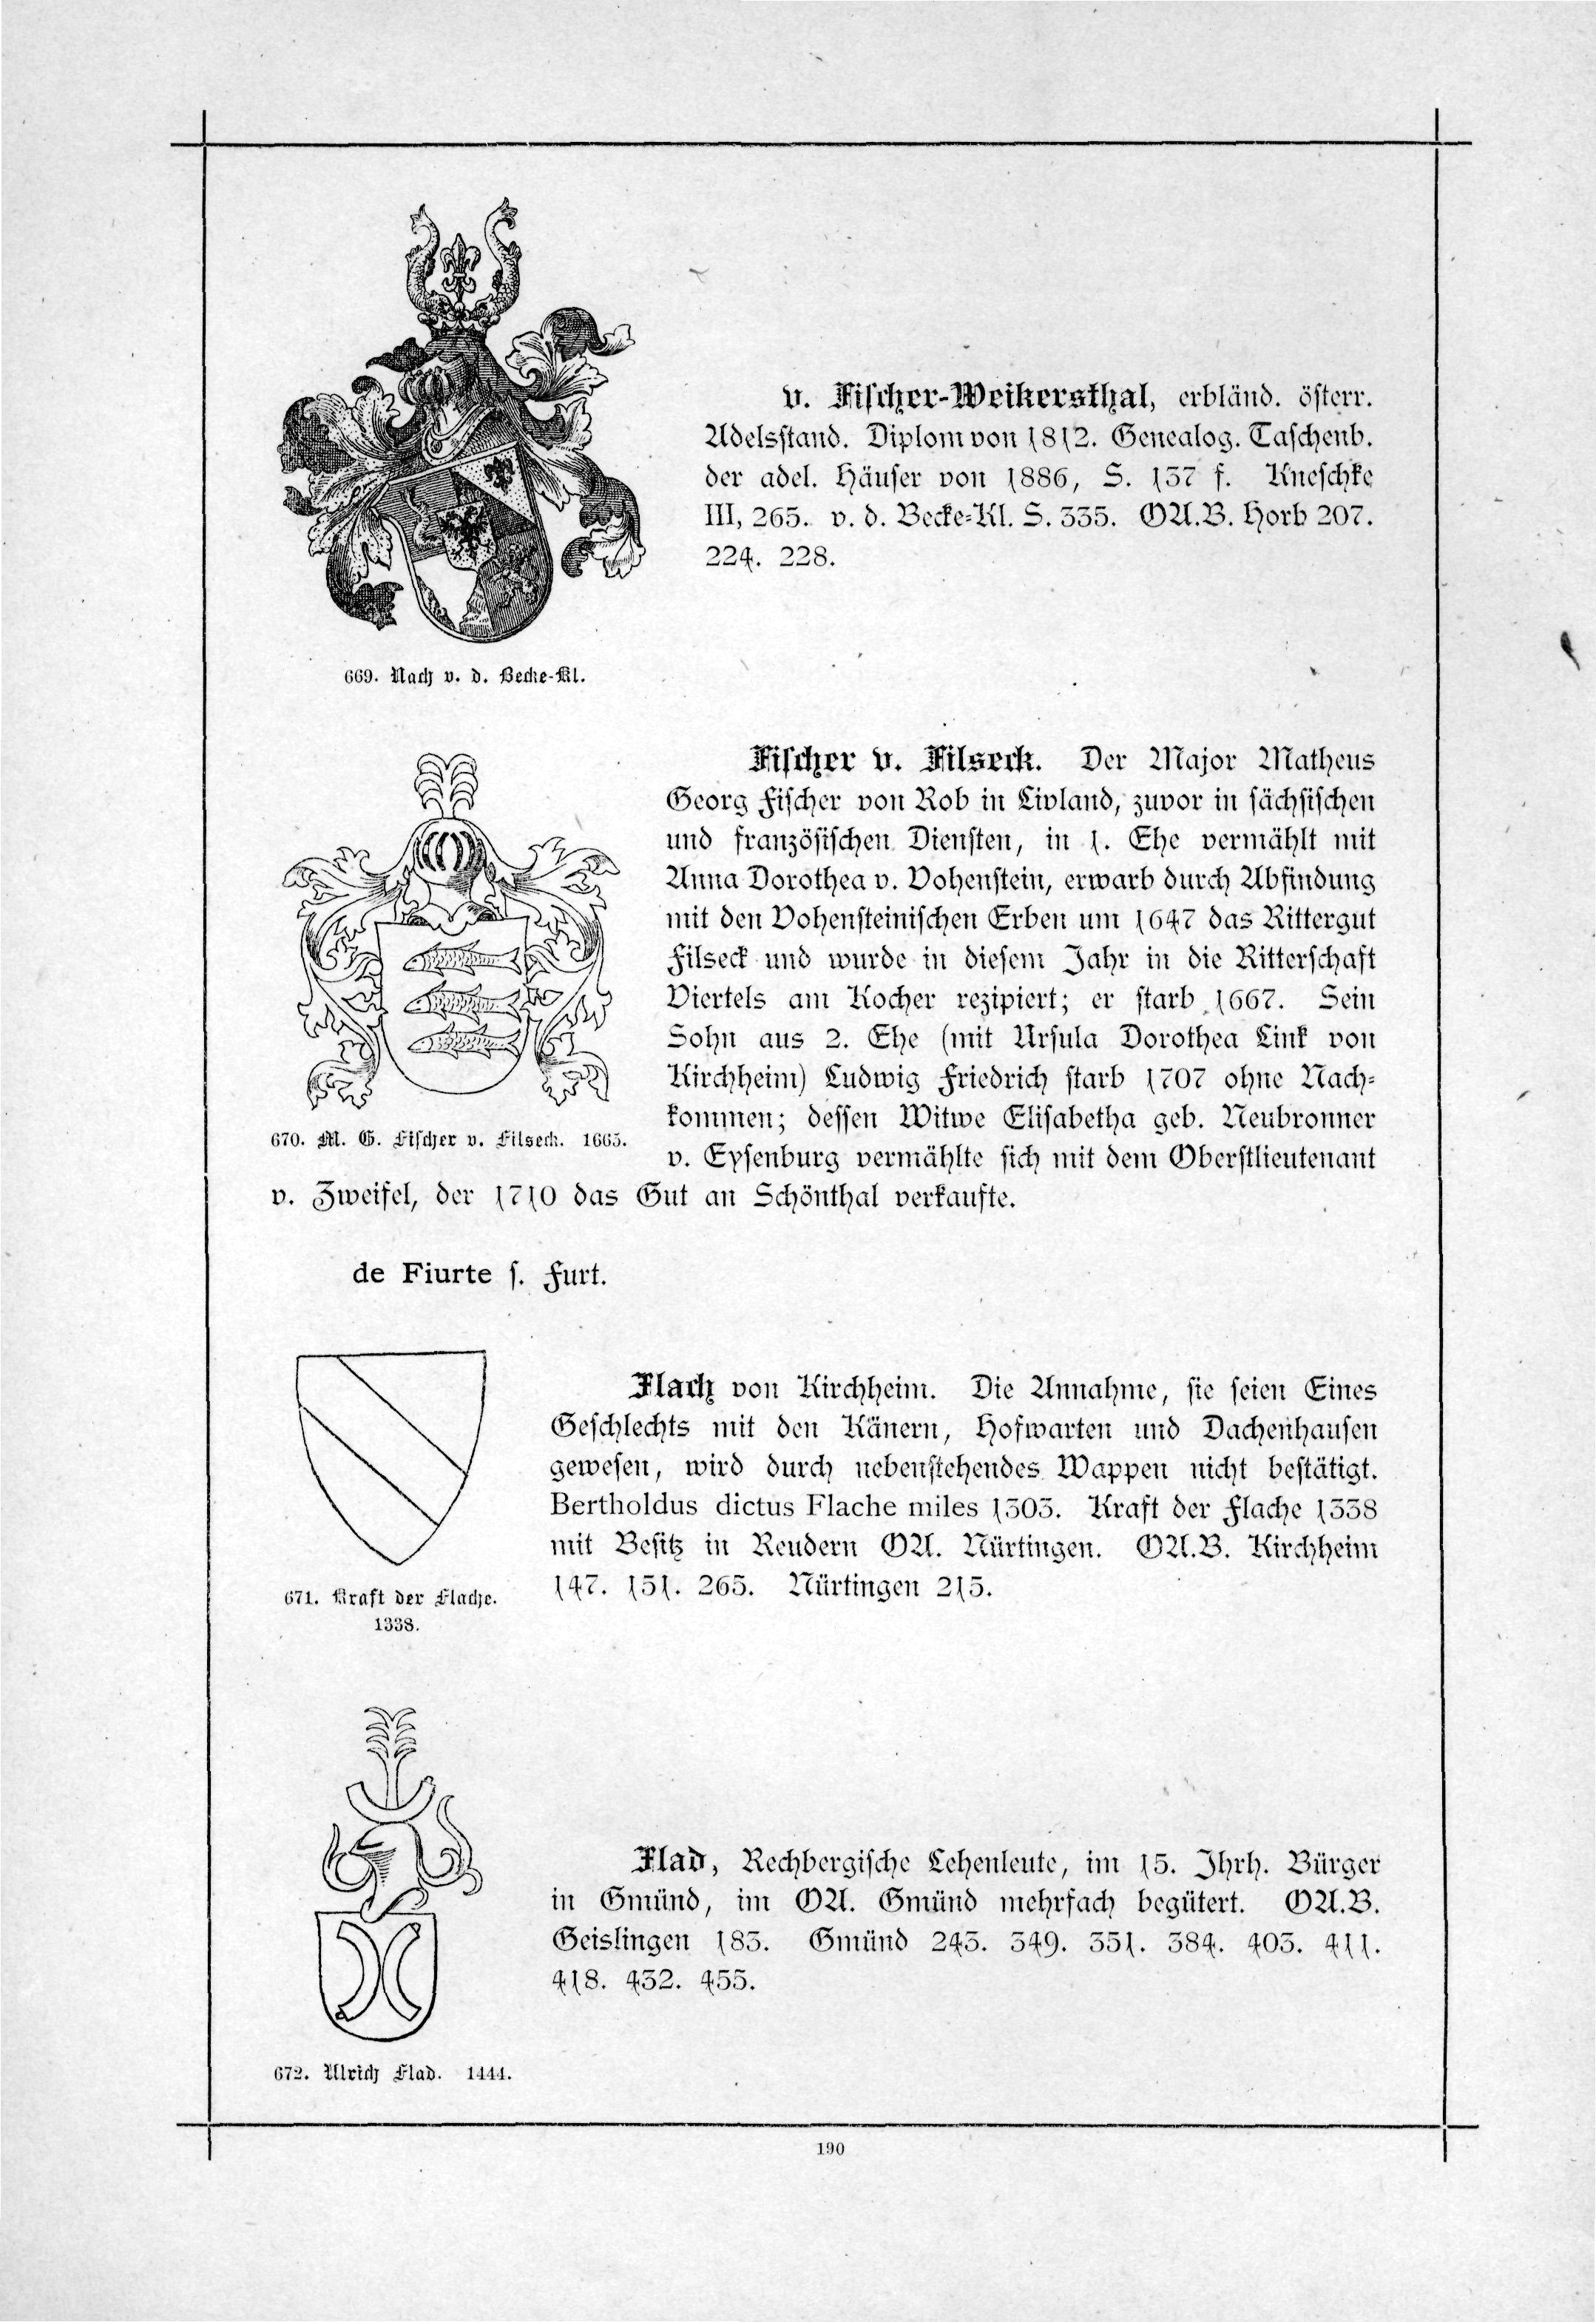 File:Alberti Wappenbuch H04 S 0190.jpg - Wikimedia Commons